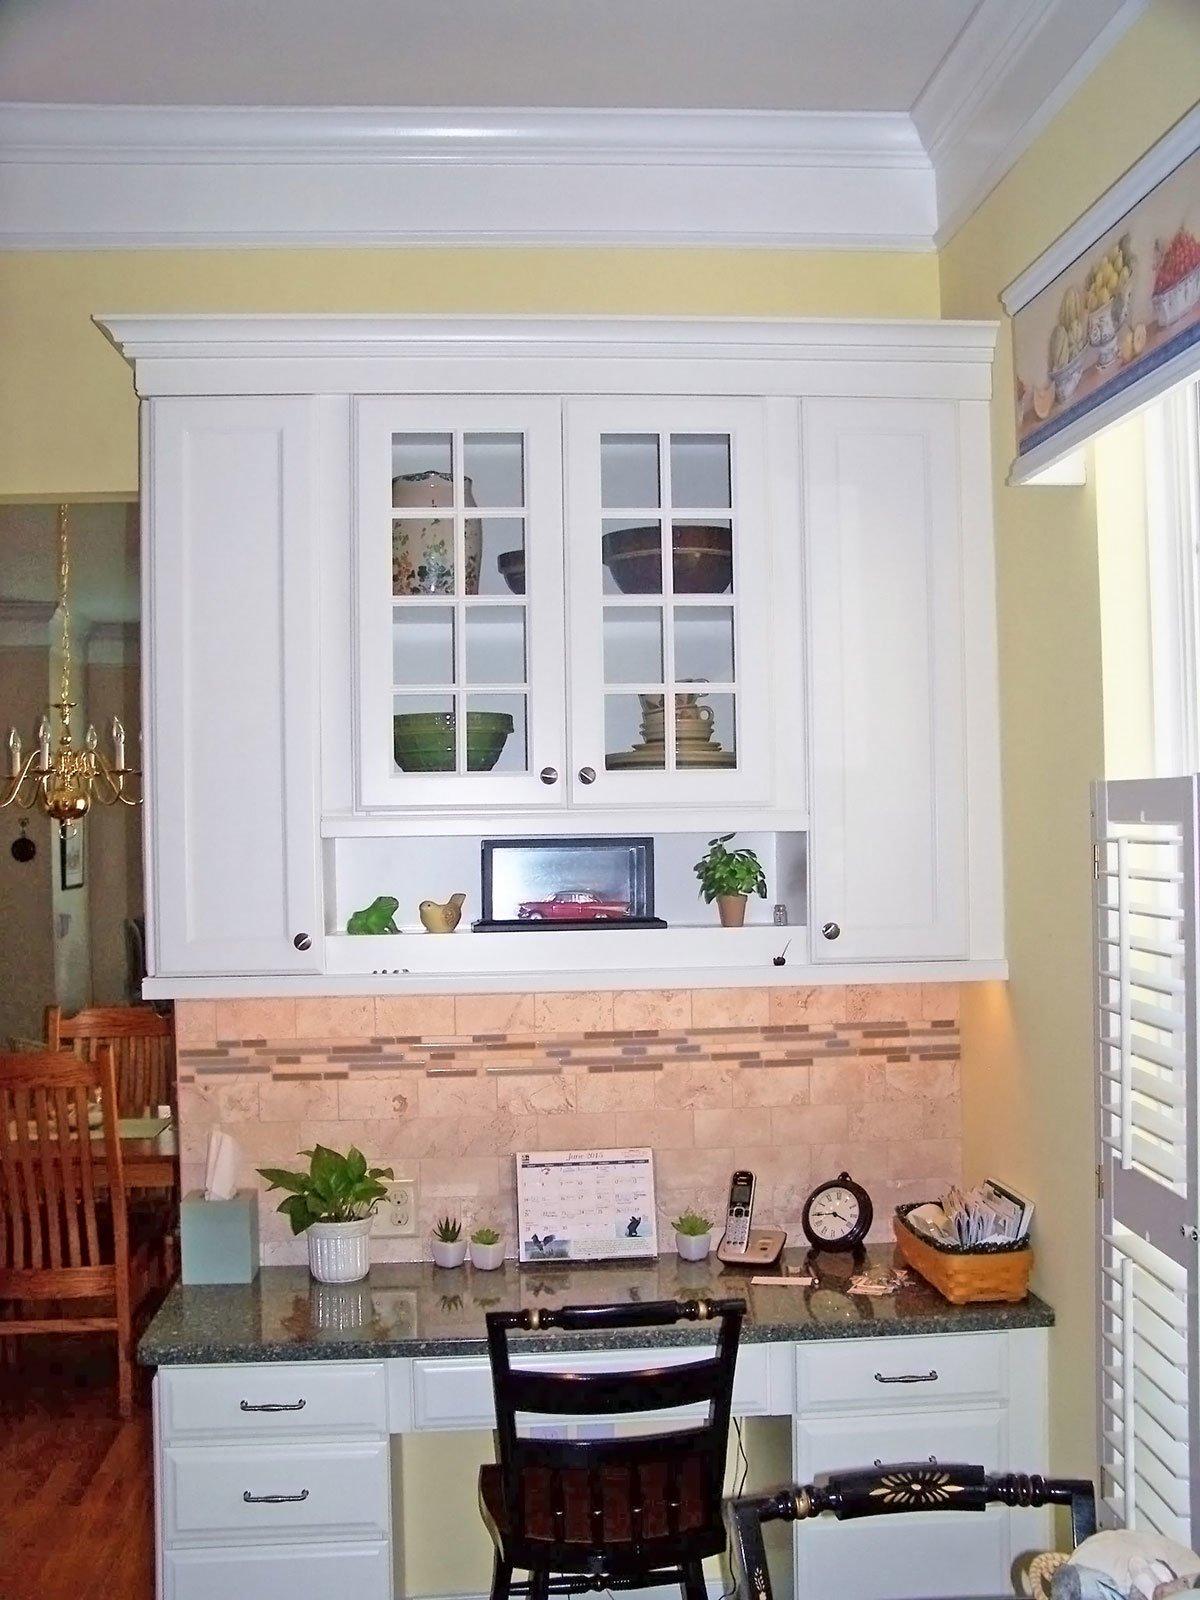 Modern Md Kitchen Image - Kitchen Cabinets | Ideas & Inspiration ...